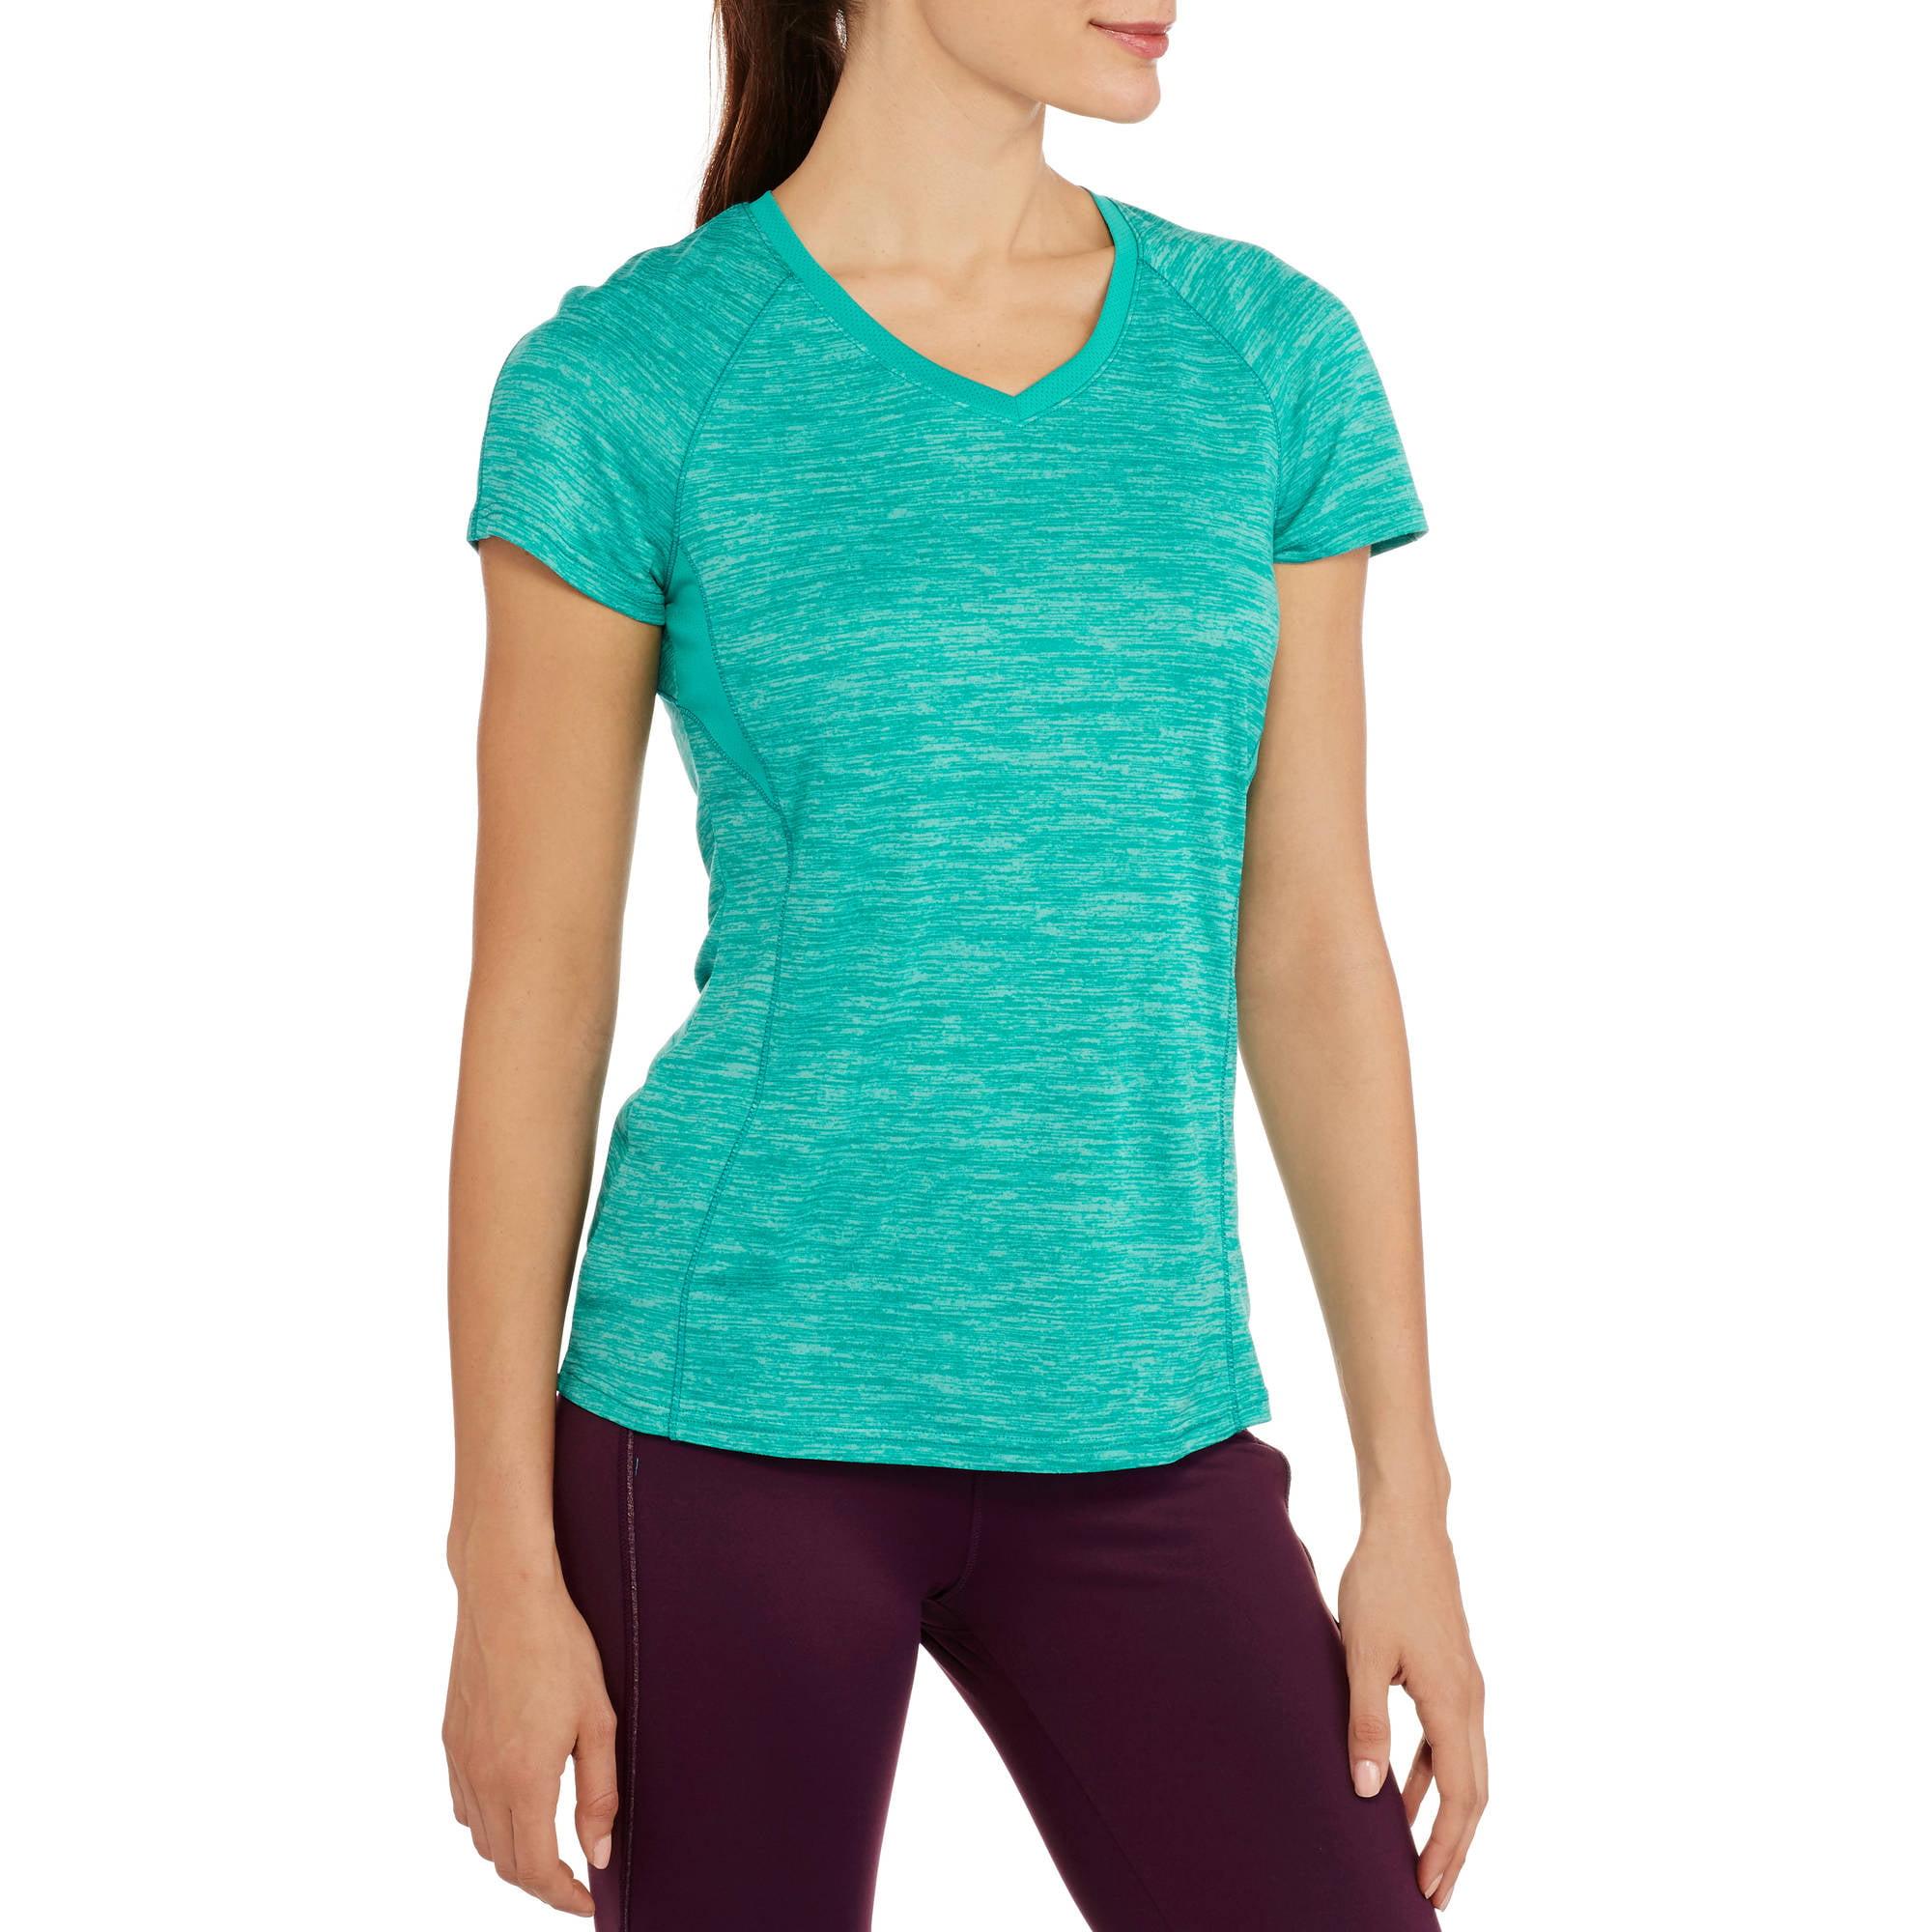 Danskin Now Women's Active Performance T-Shirt